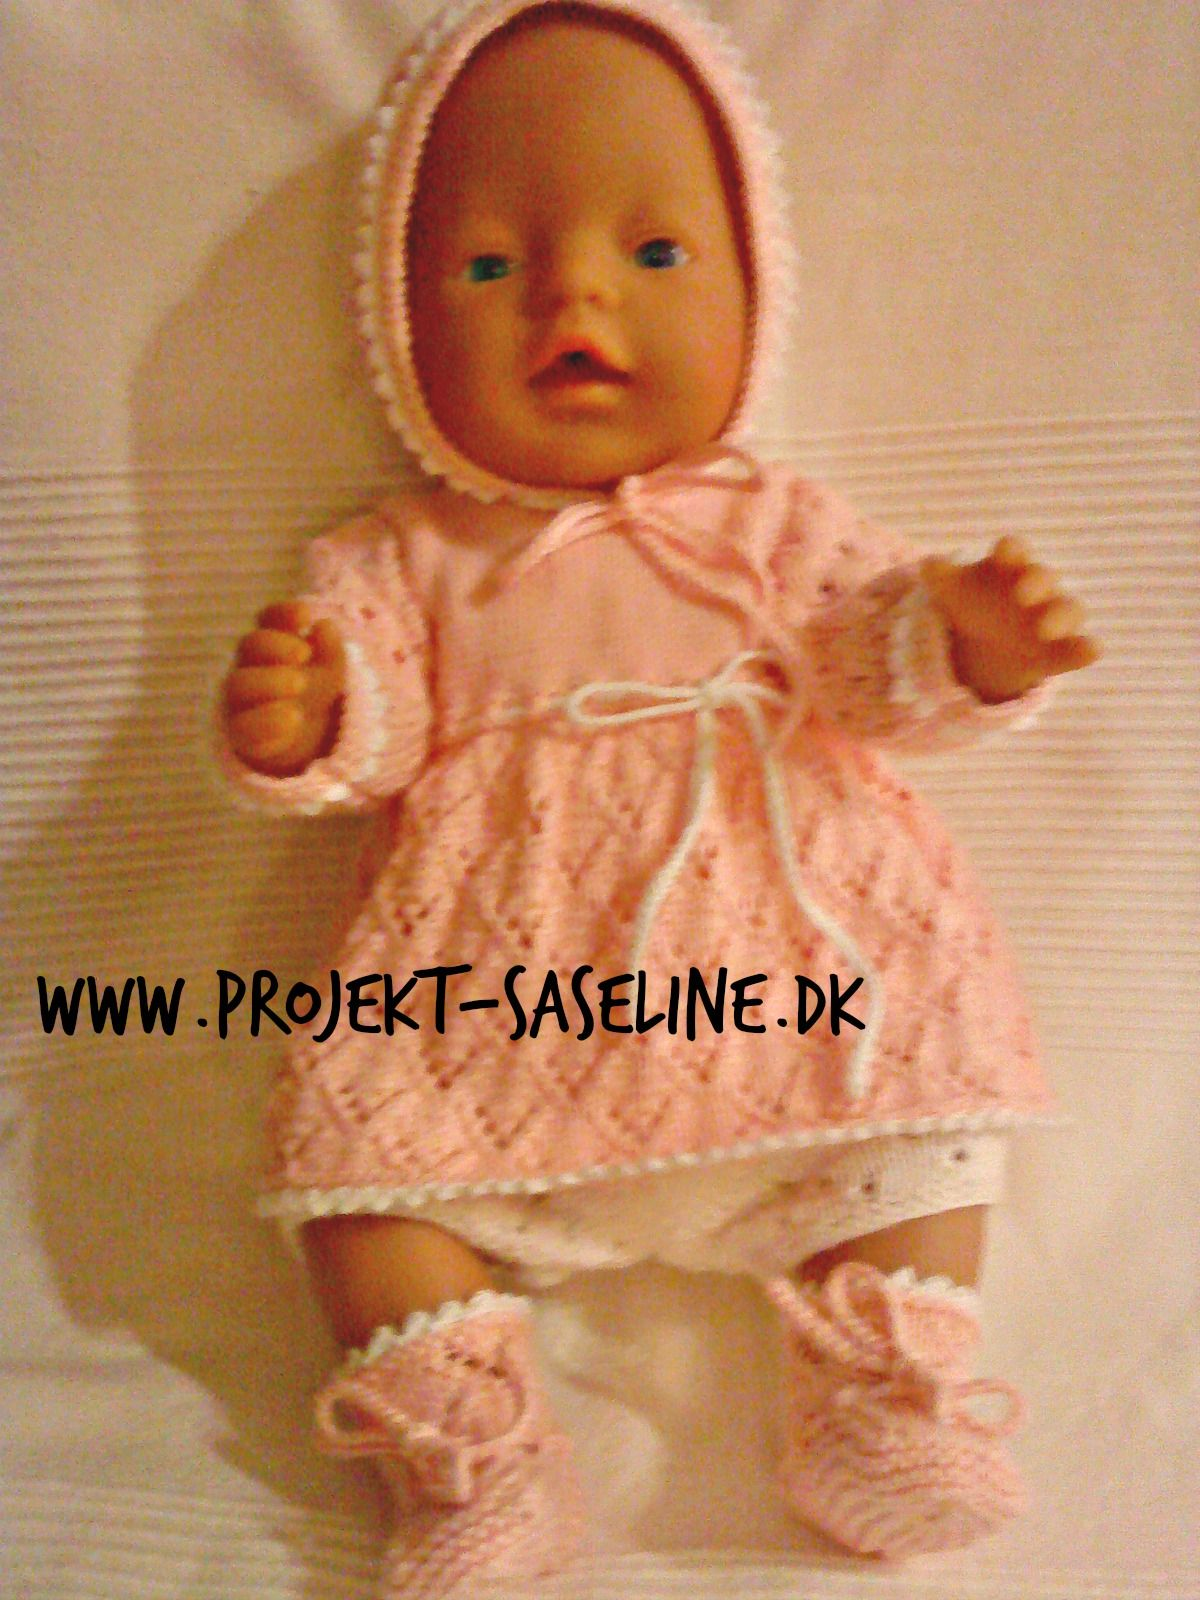 Pinterest Baby Born Projekt Opskrifter Saseline R7xIq7F